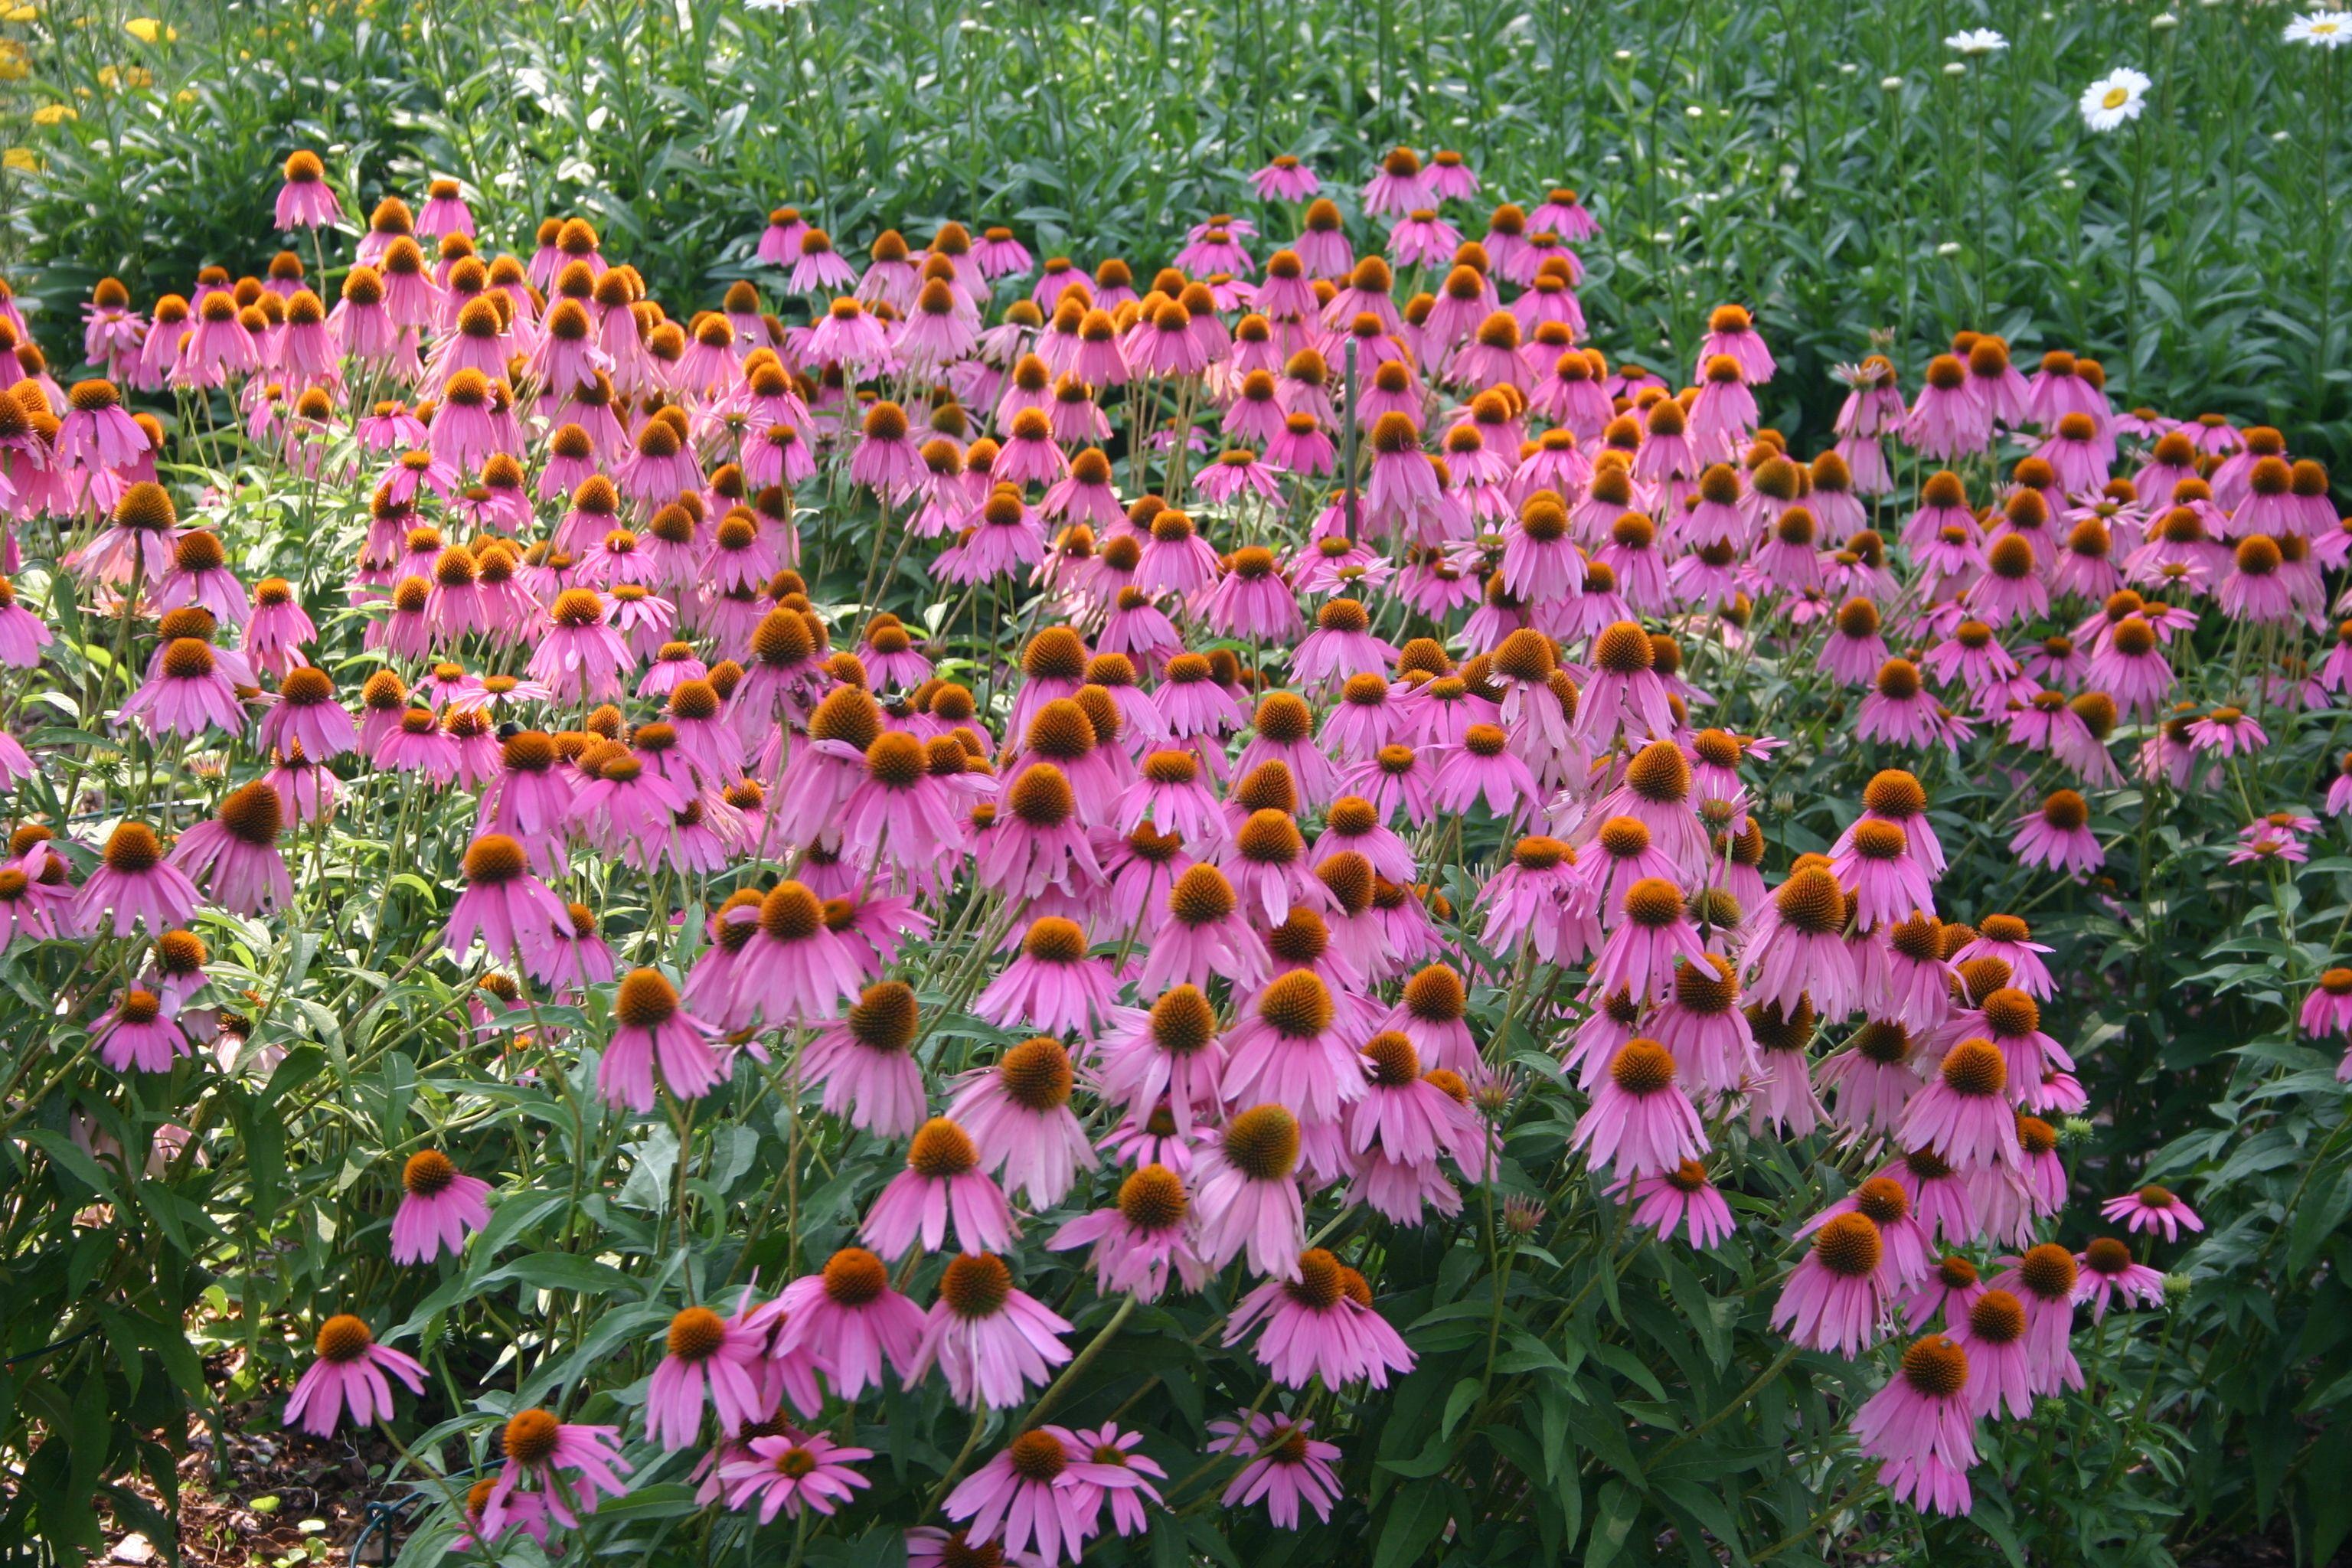 echinacea purpurea standort anspr che volle sonne in feuchtem boden jedoch ohne staun sse. Black Bedroom Furniture Sets. Home Design Ideas